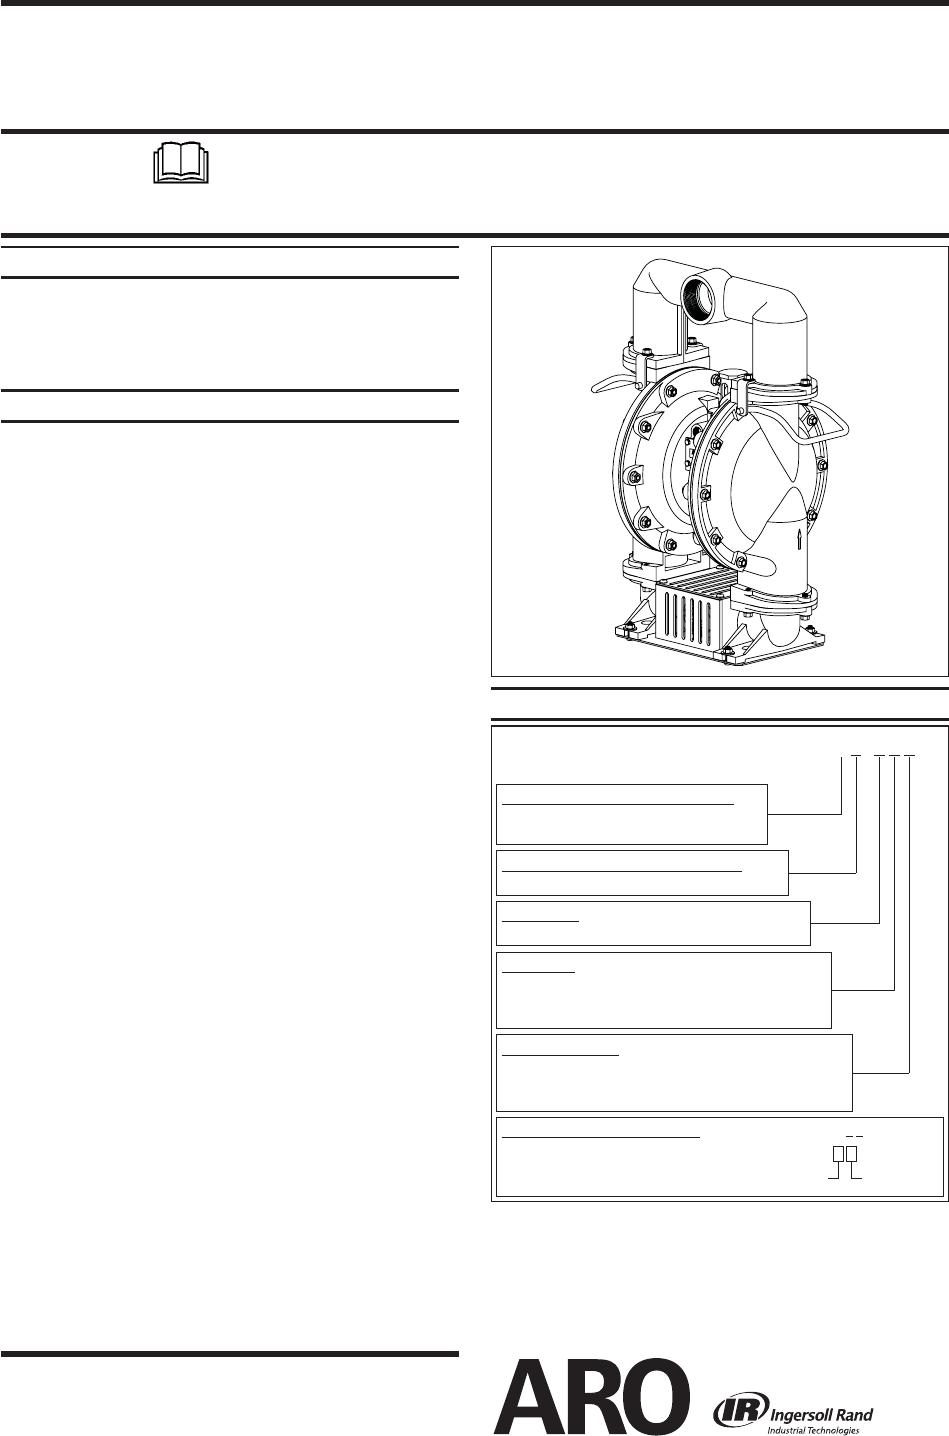 Ingersoll Rand Aro 66M3X0 Xxx C Users Manual EN_ed05